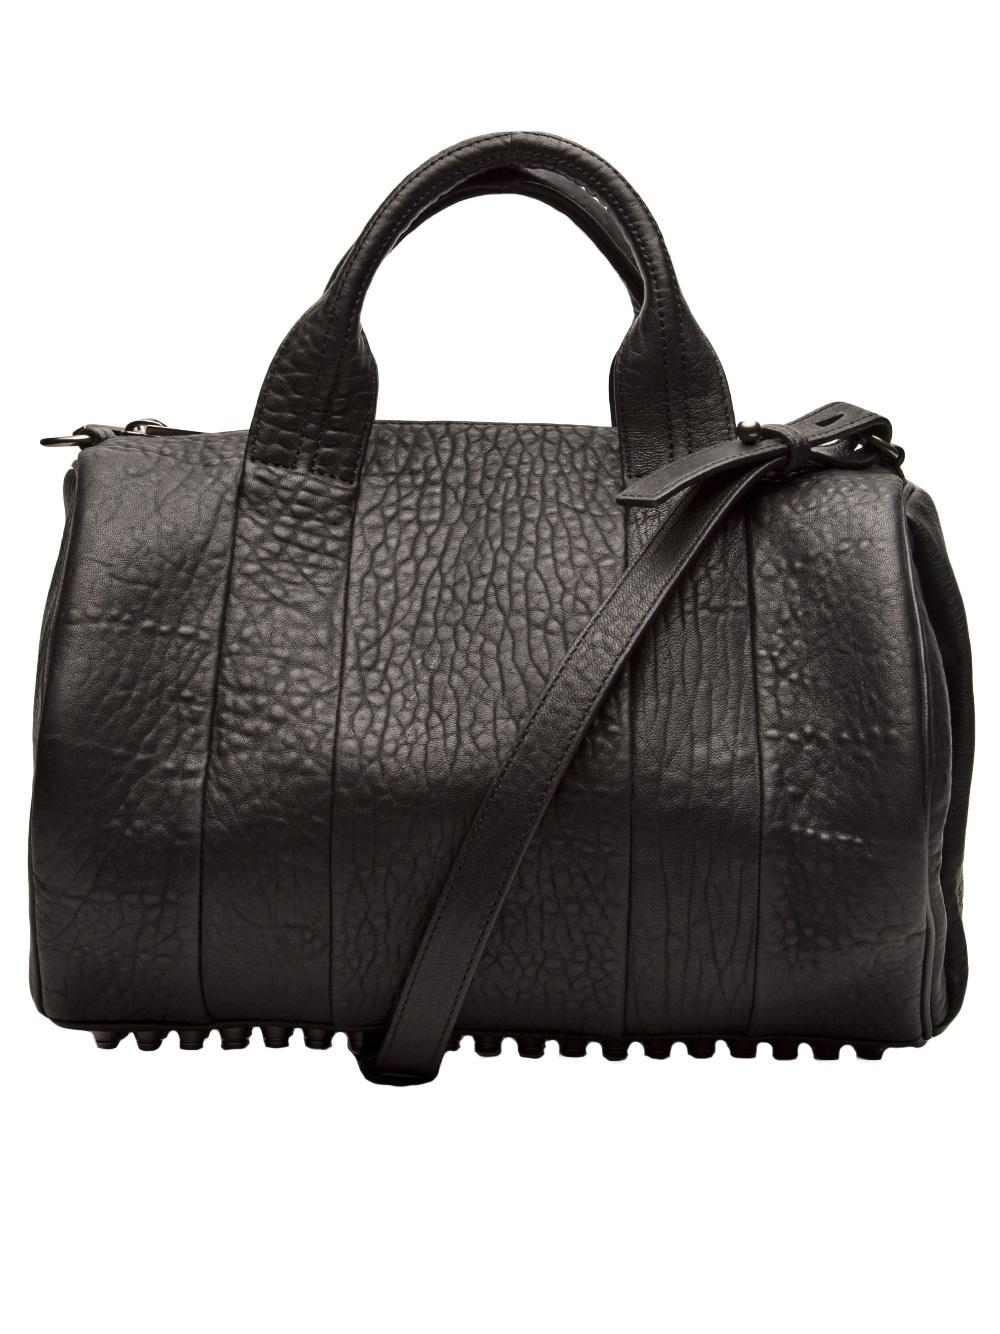 lyst alexander wang rocco dumbo stud bottom satchel bag. Black Bedroom Furniture Sets. Home Design Ideas